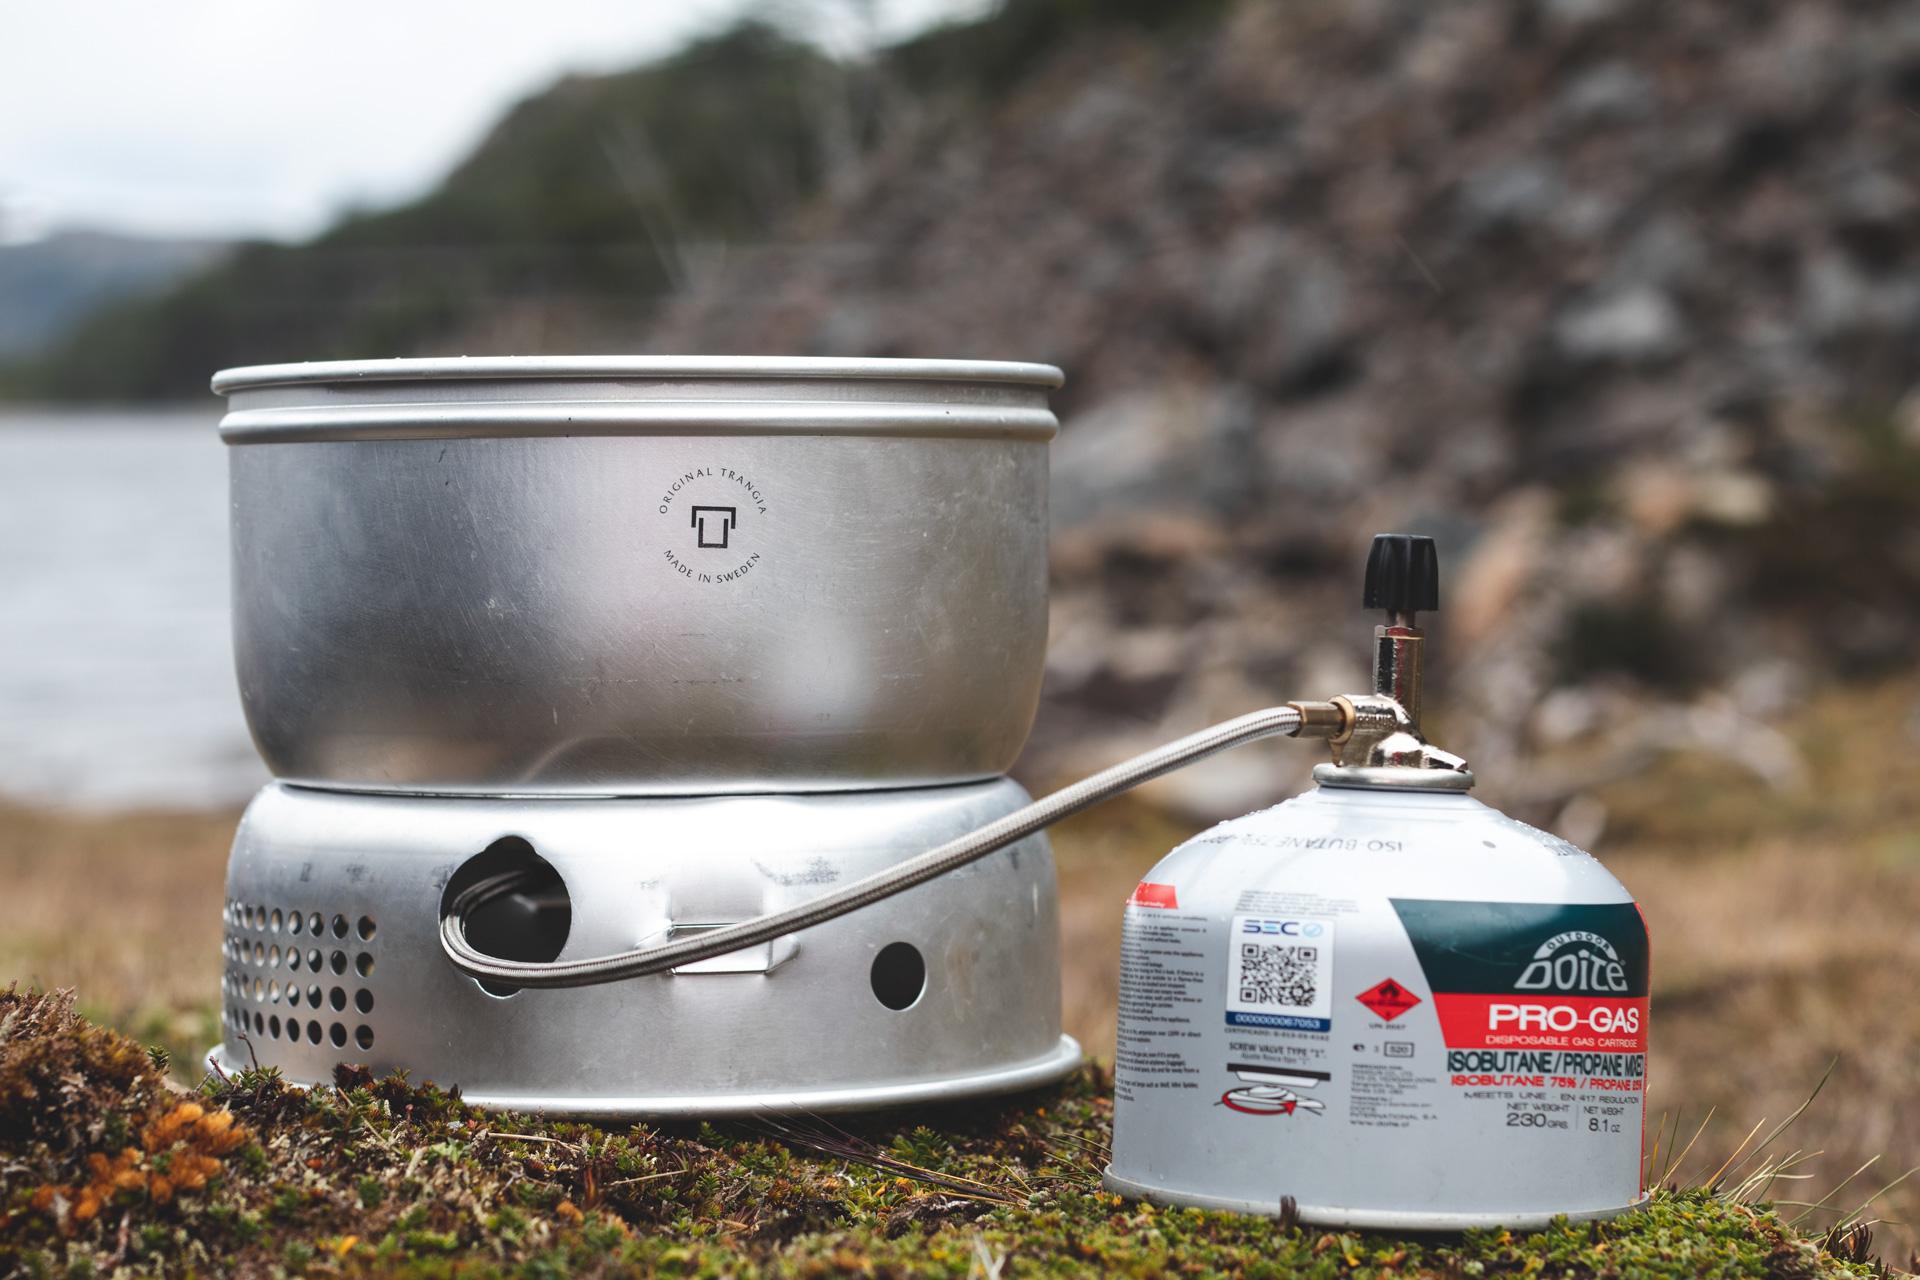 Trangia 25-4 UL (Ultralight Aluminium) Cooking Set